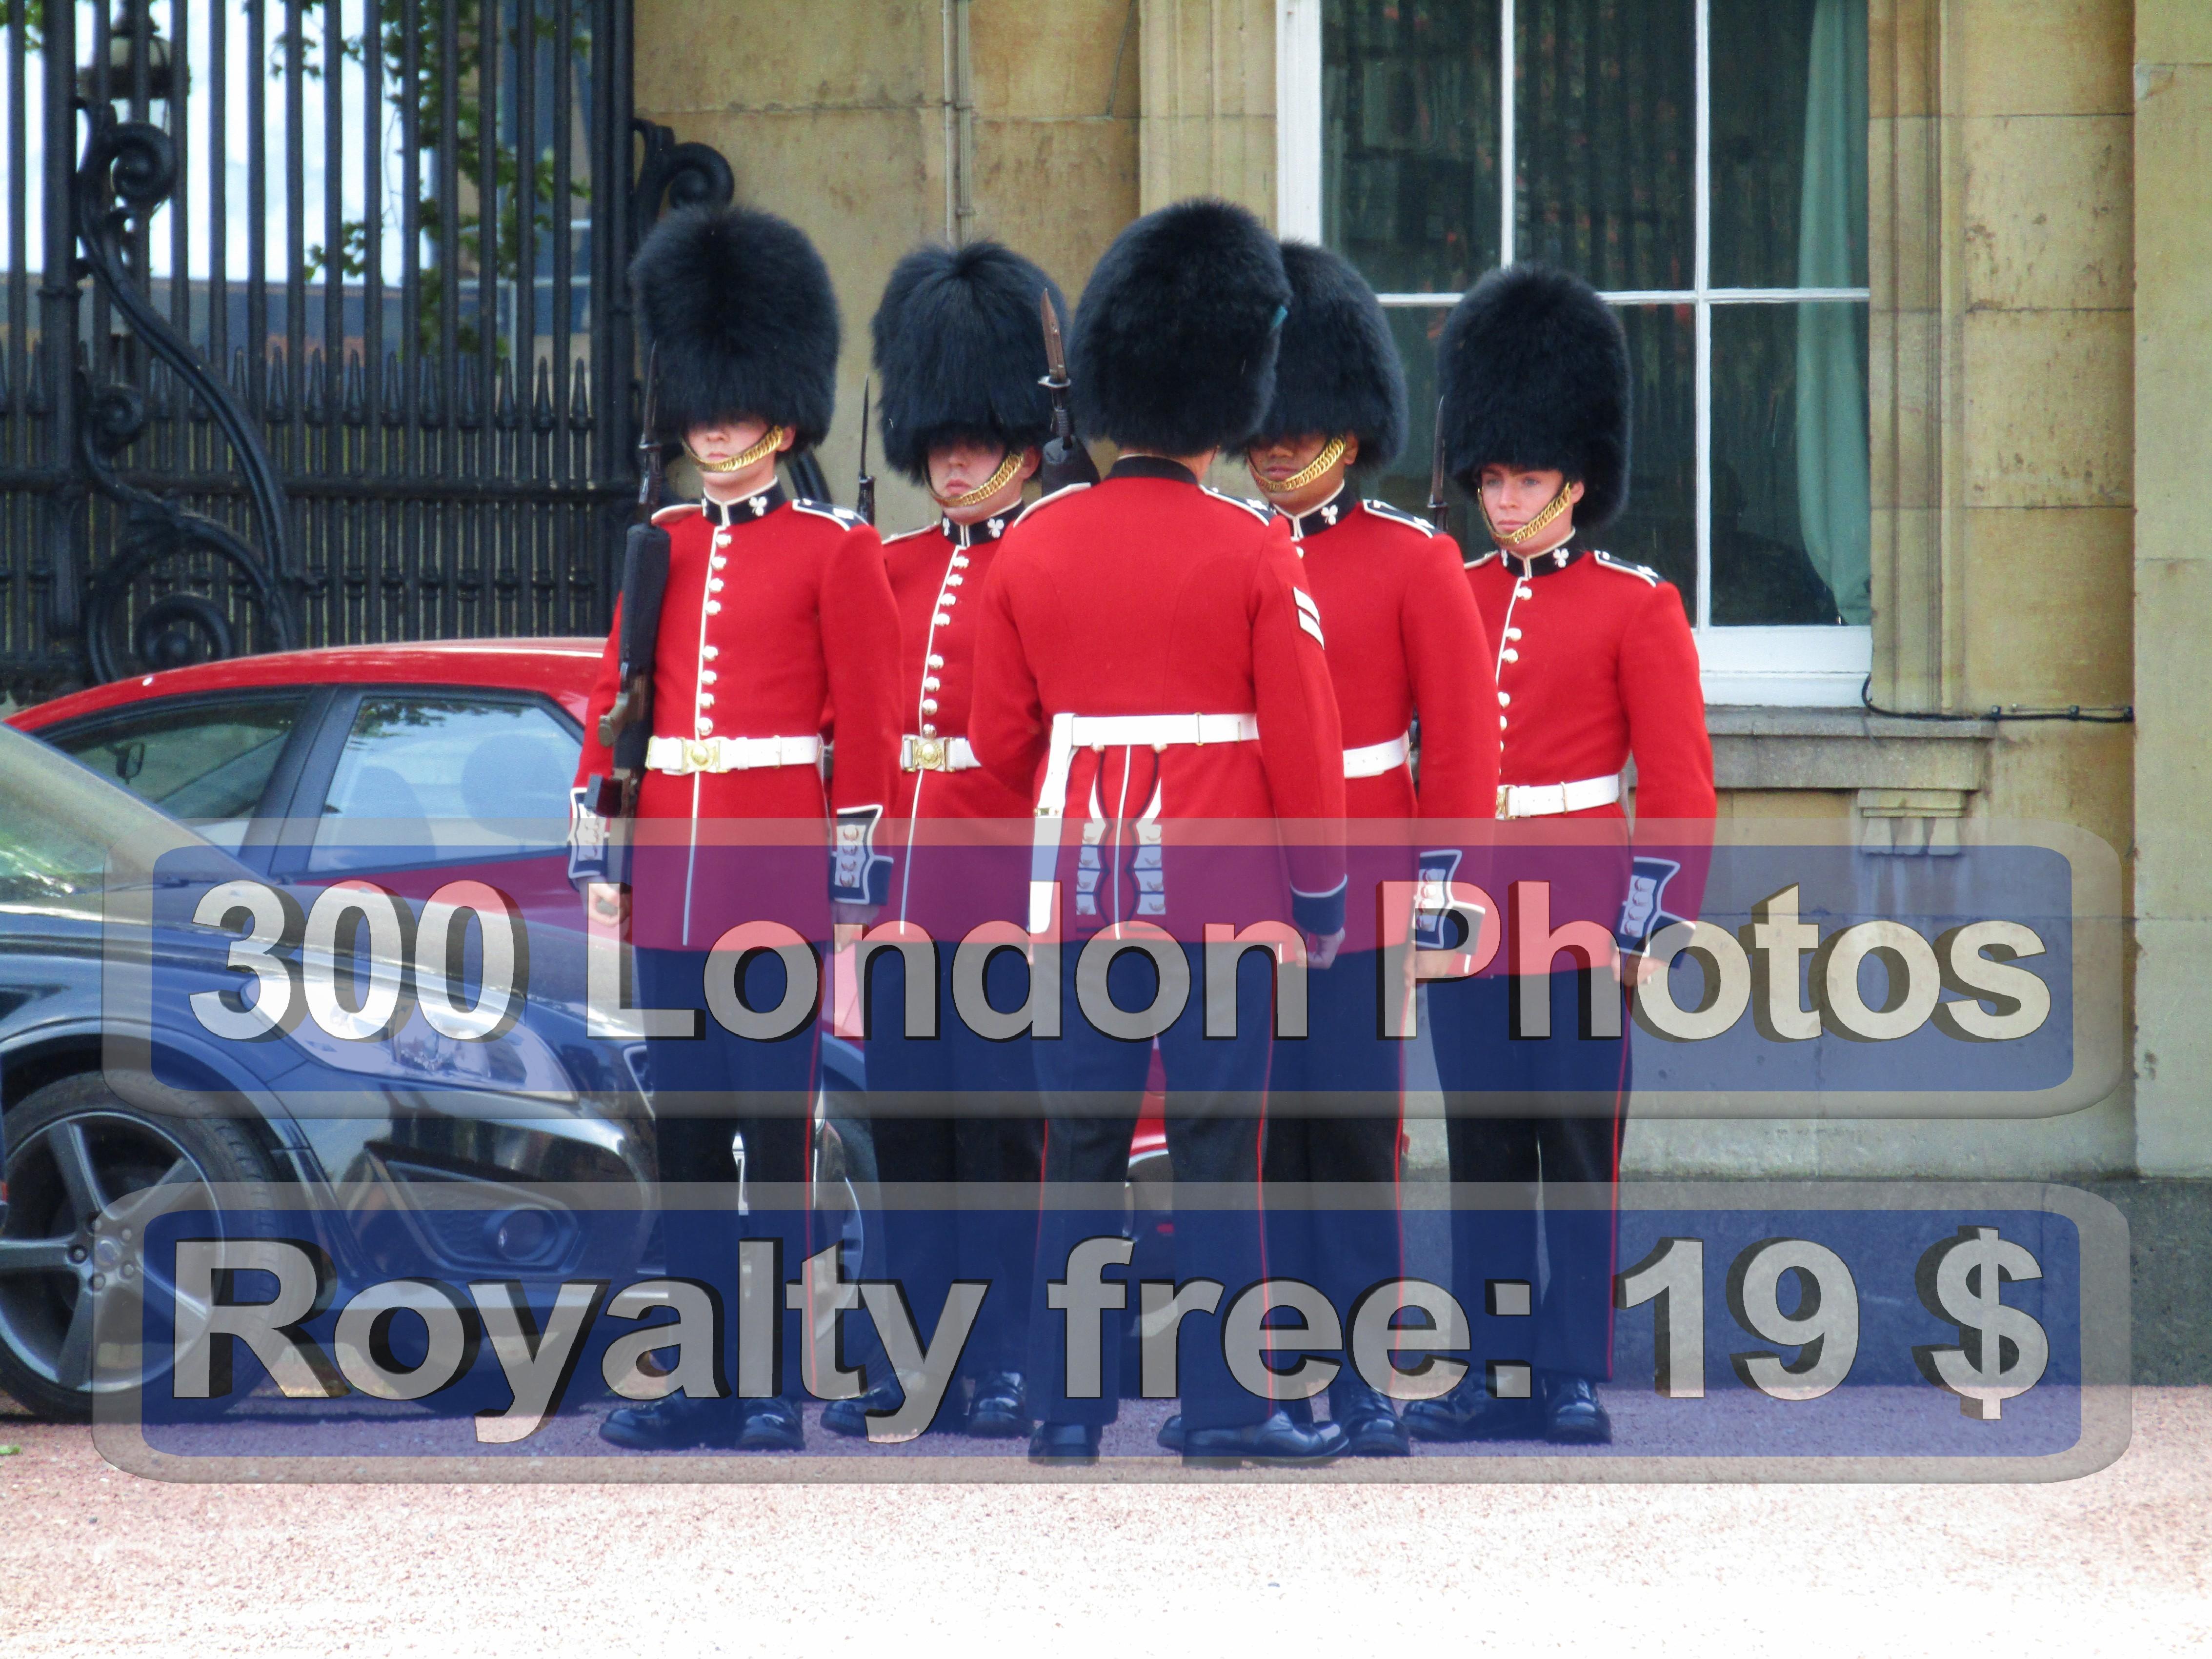 London Photo Book